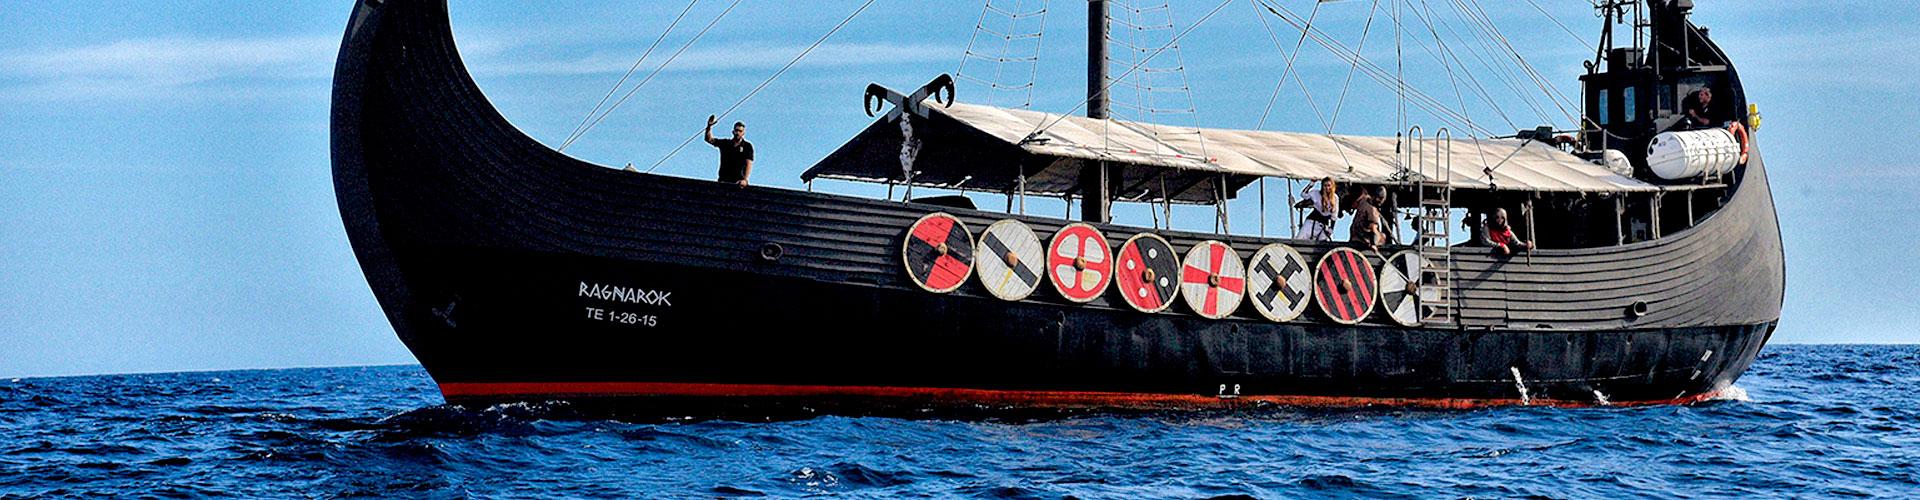 Viking Cruise – Ragnarok